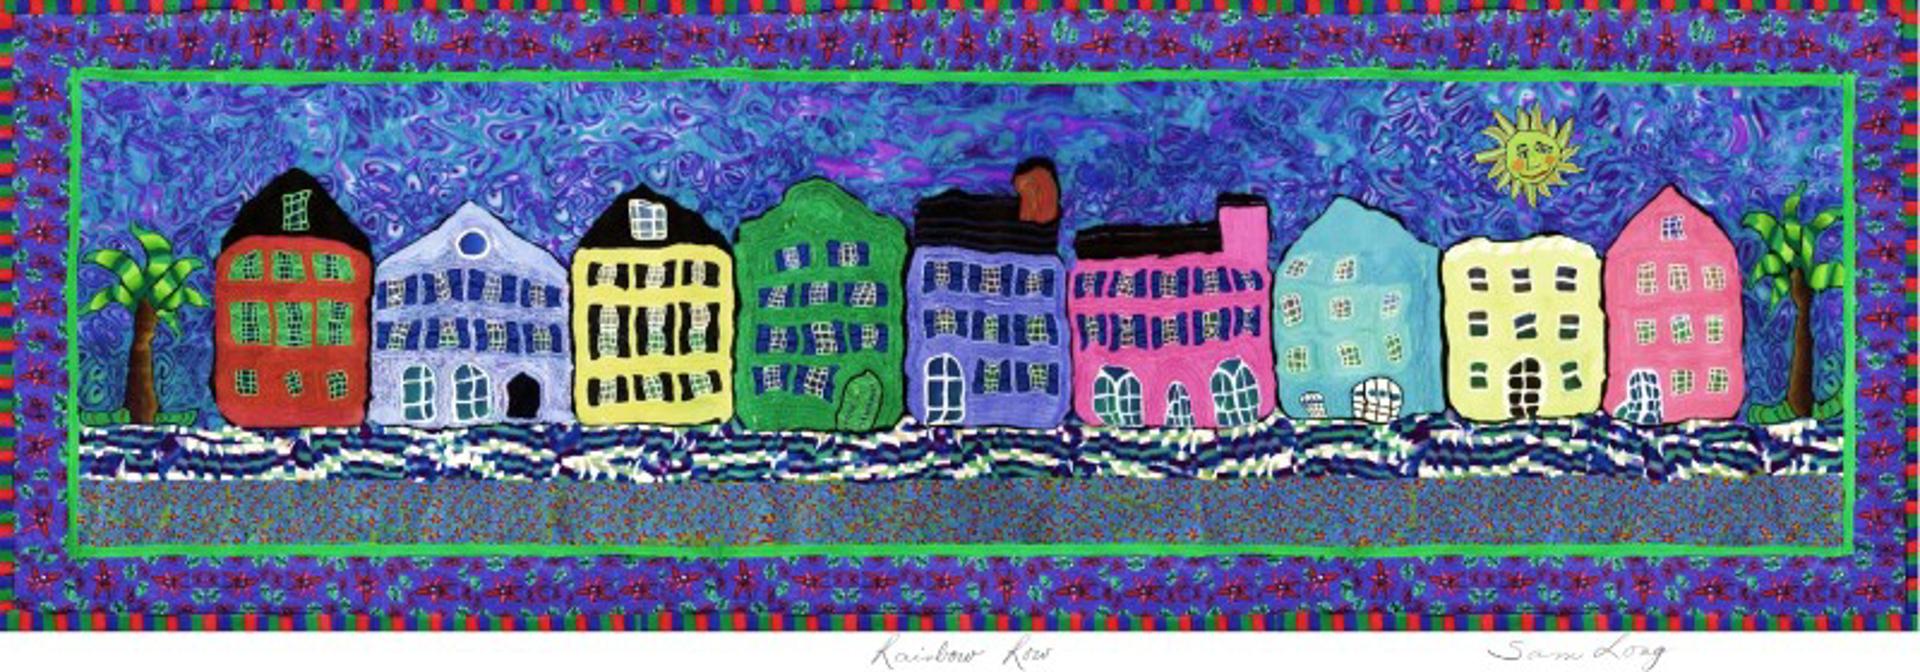 Rainbow Row by Samantha Long - Prints